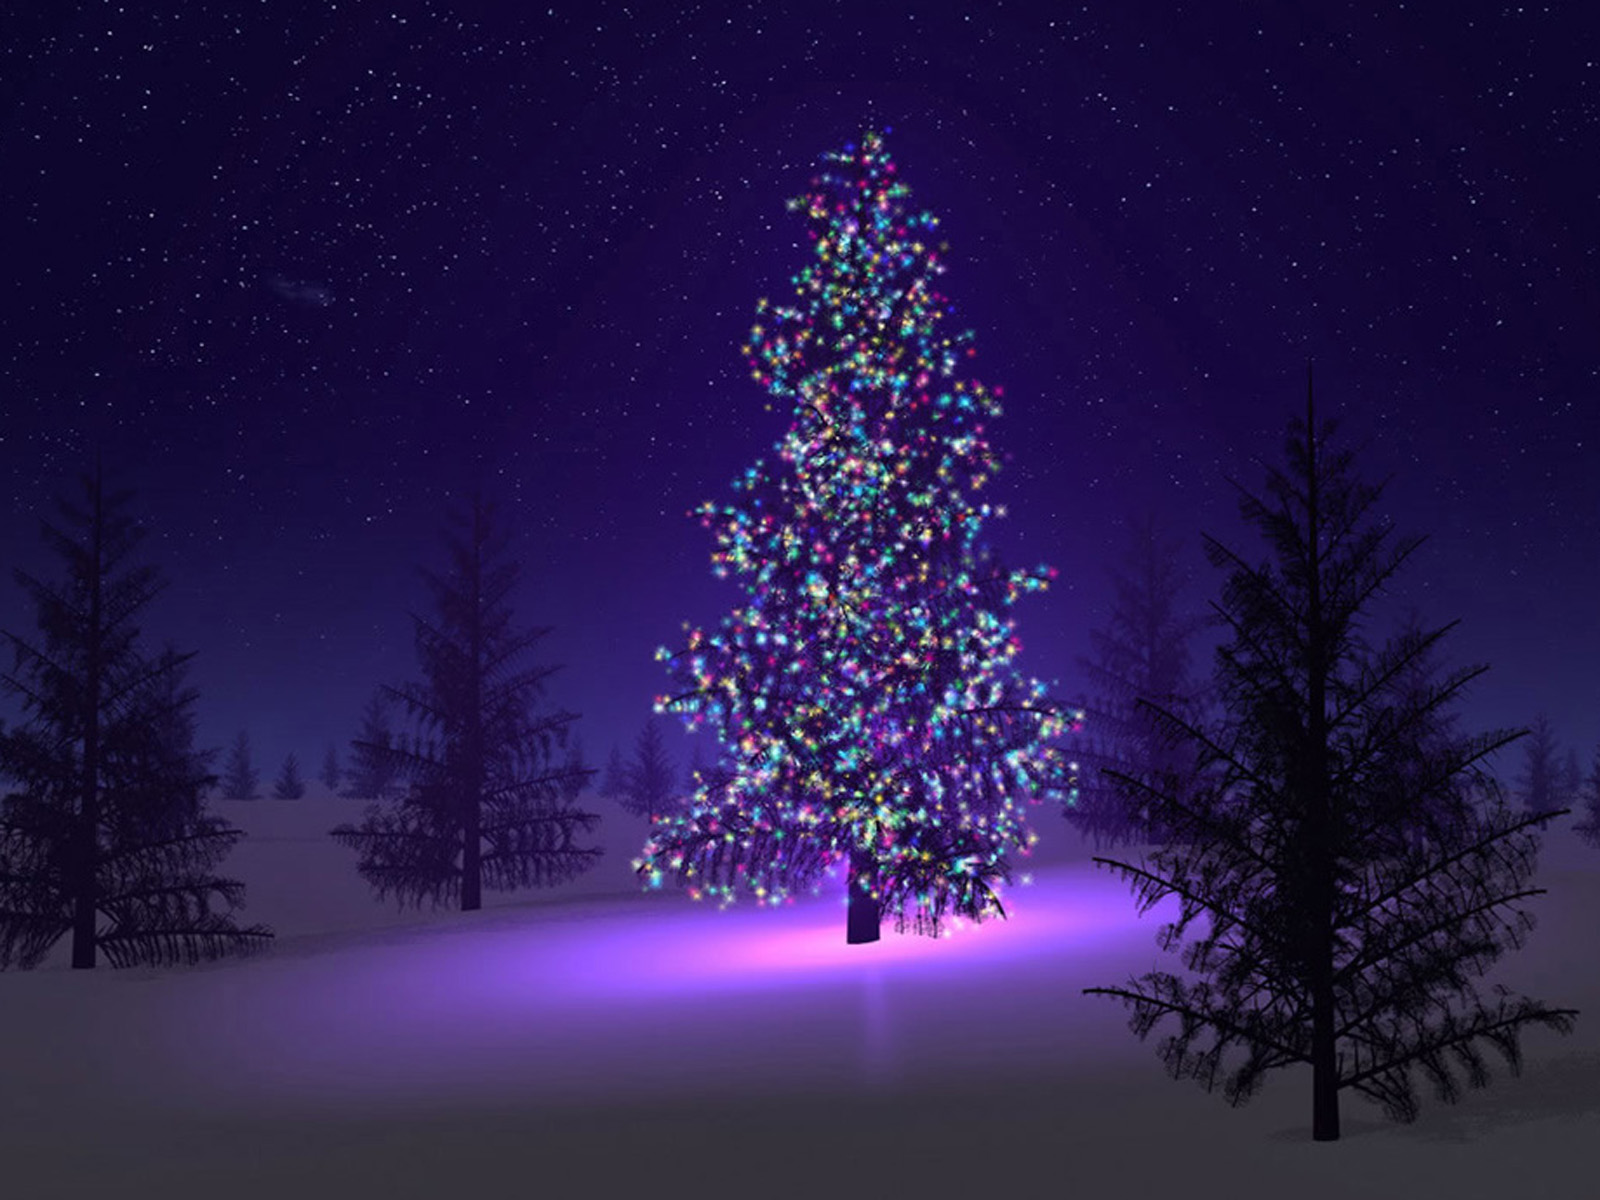 wallpaper: Christmas Trees Wallpapers